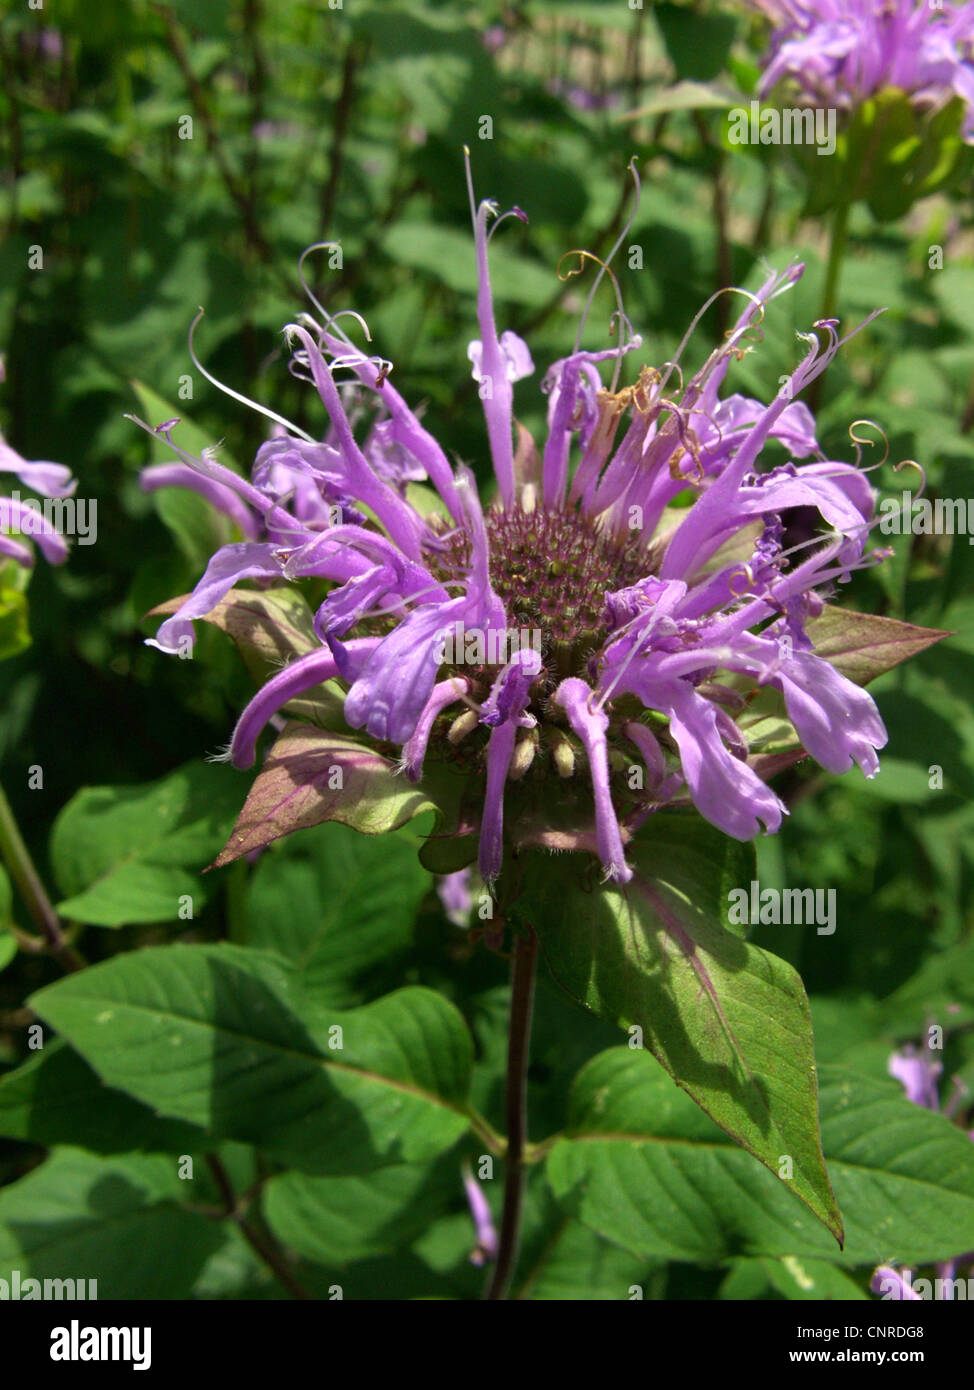 wild bergamot bee-balm (Monarda fistulosa), inflorescence - Stock Image